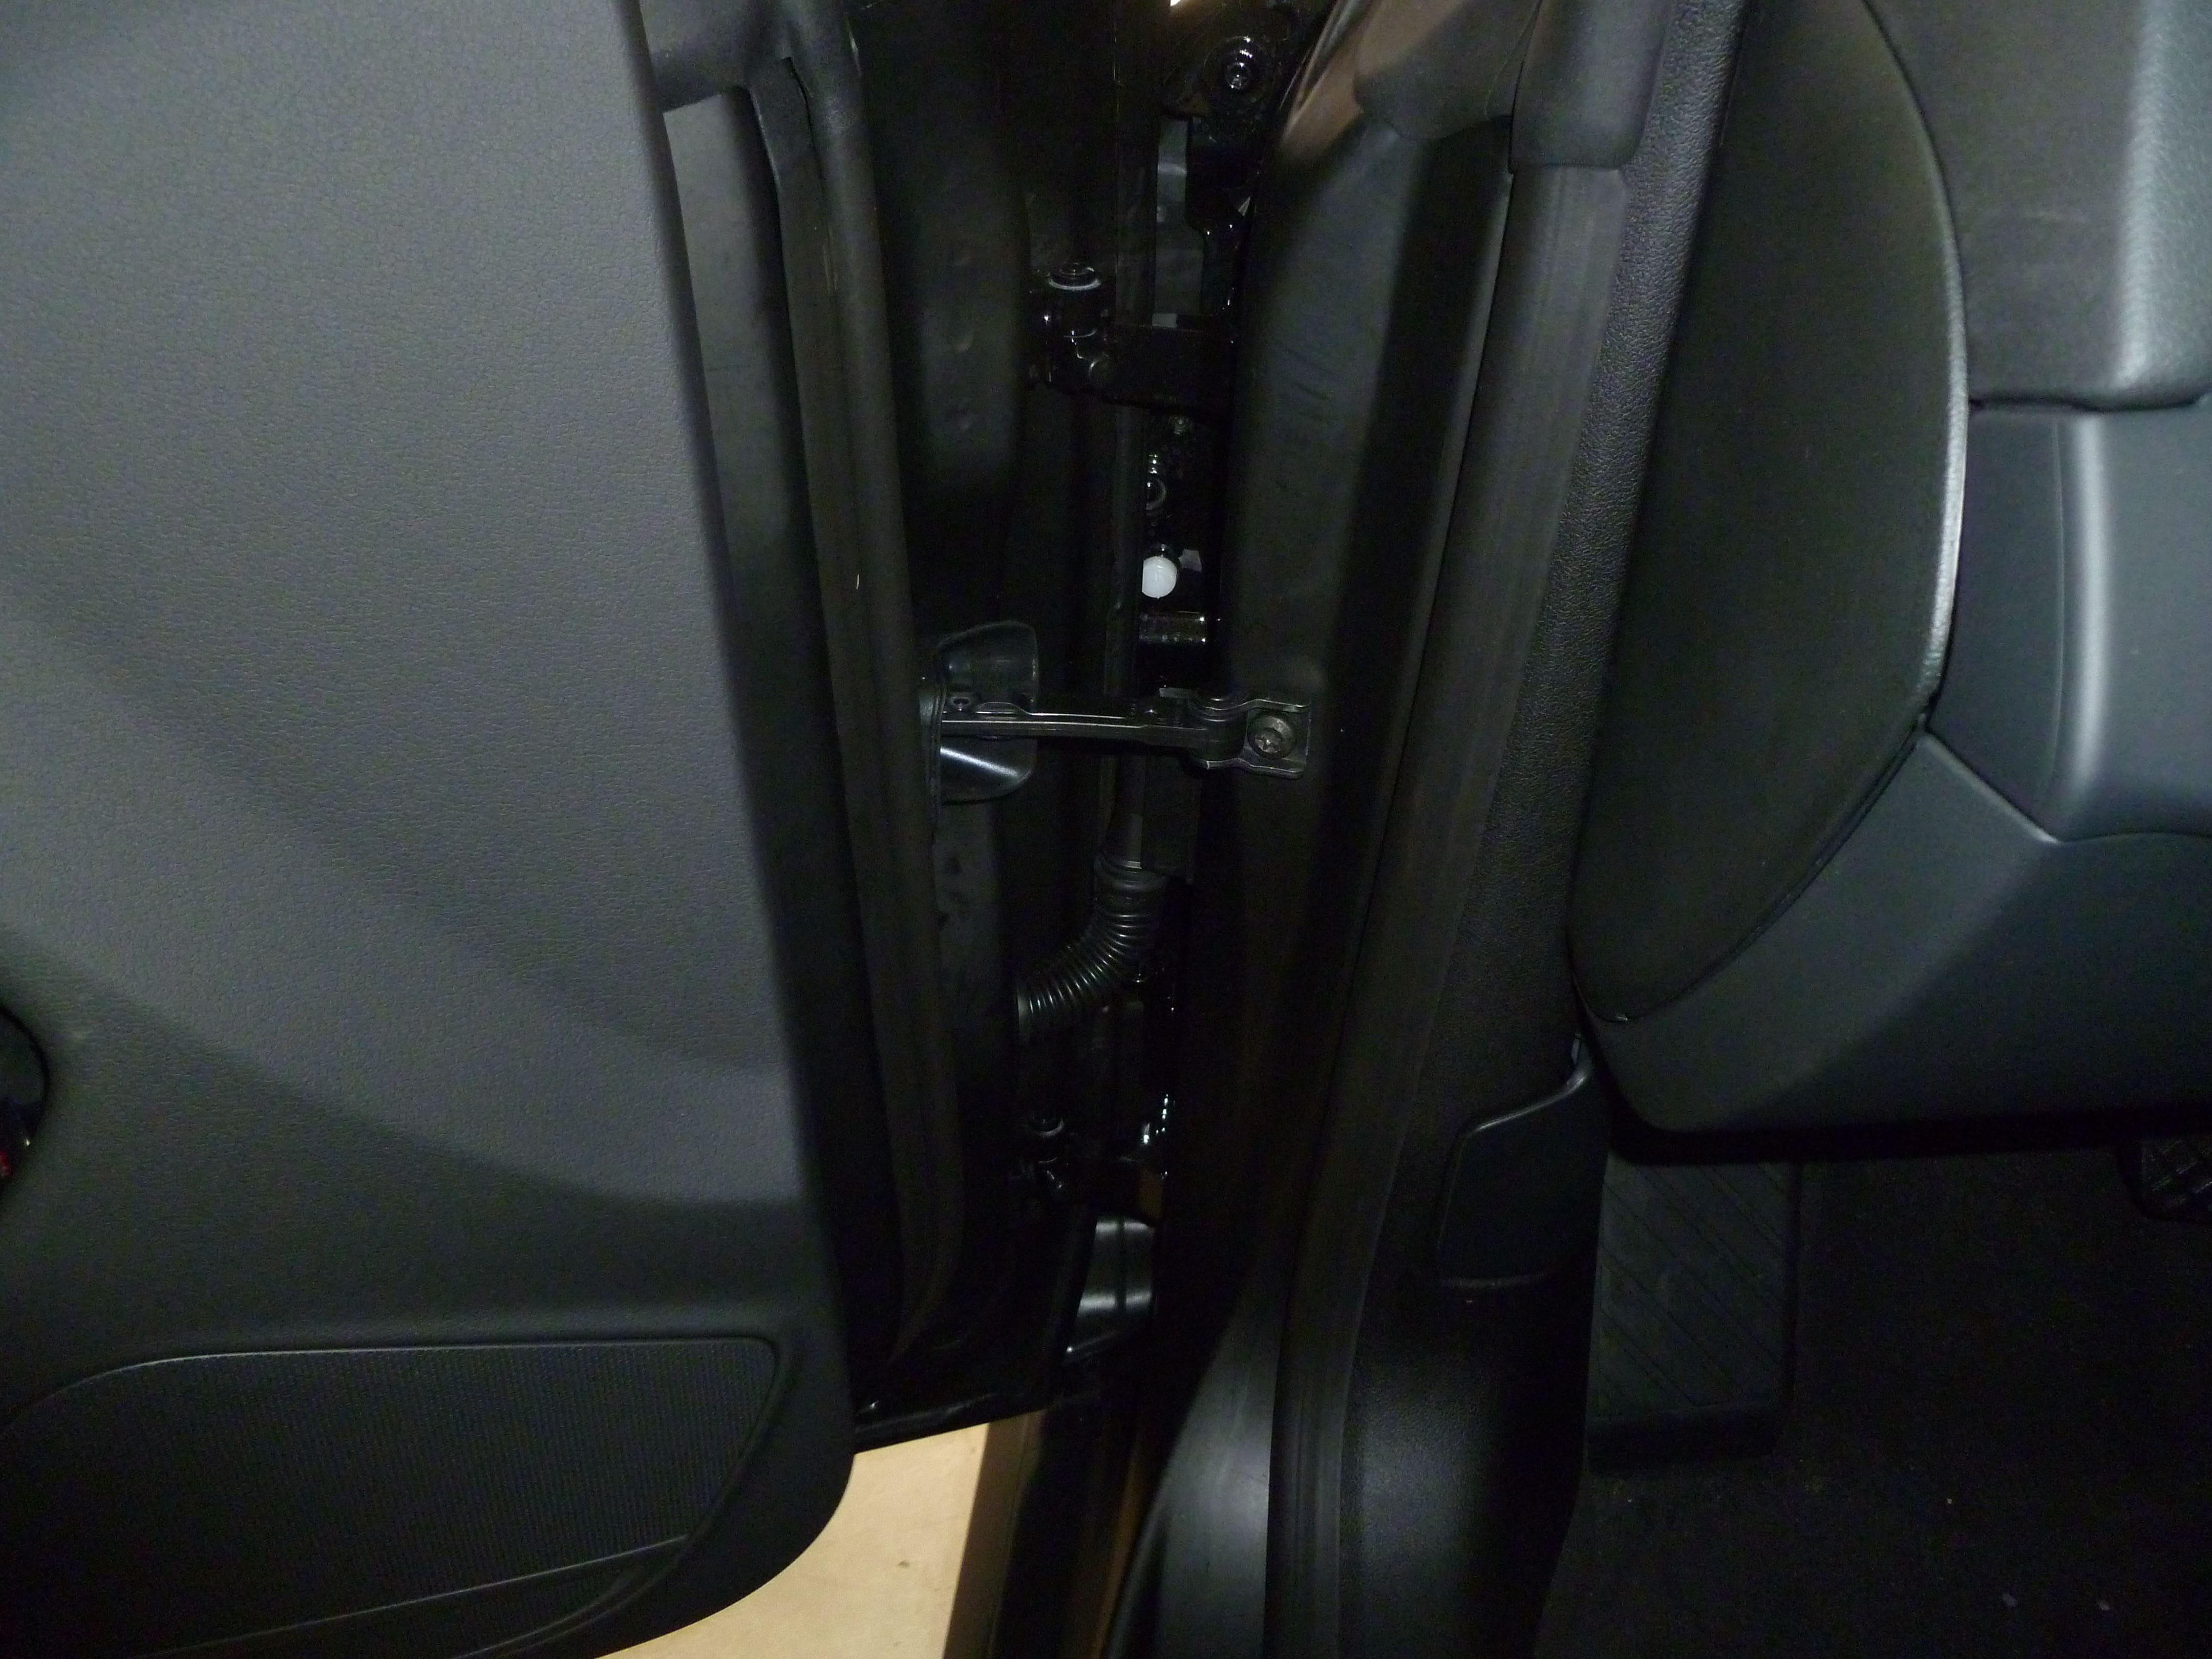 Audi A5 Coupe met Mat Zwarte Wrap, Carwrapping door Wrapmyride.nu Foto-nr:4659, ©2021